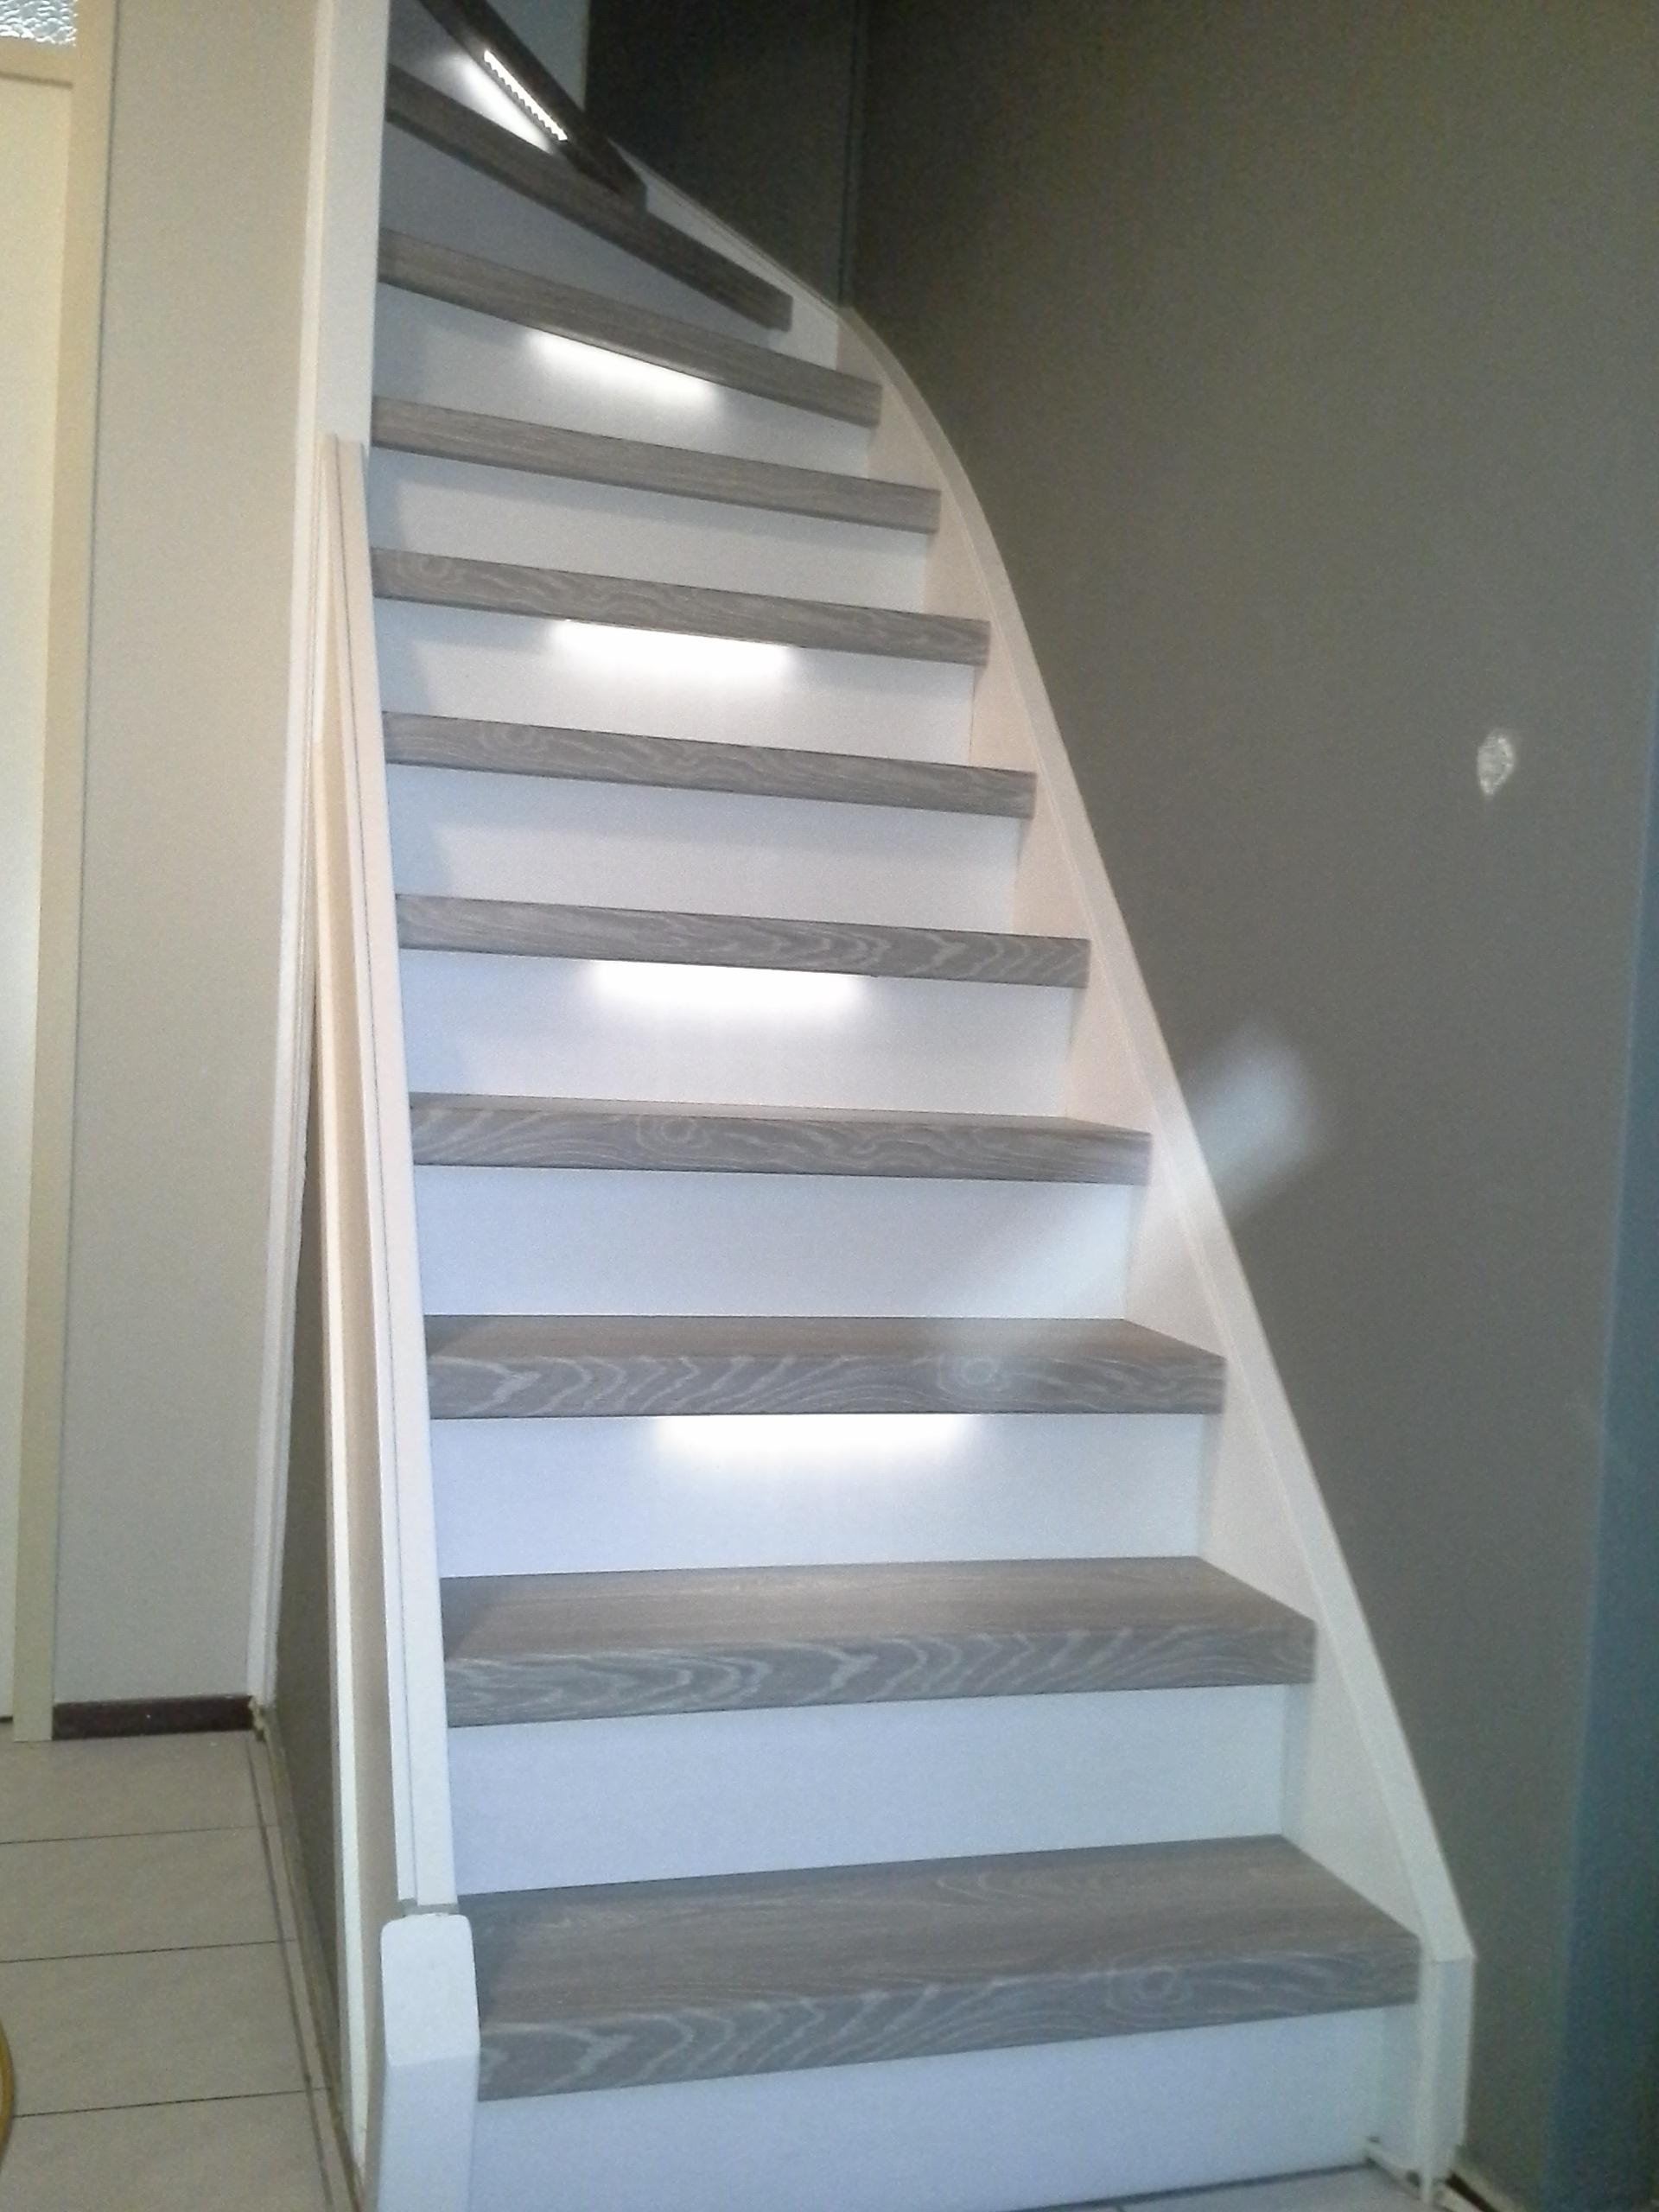 Fotos den bosch edwin laven timmerwerken - Witte trap grijs ...